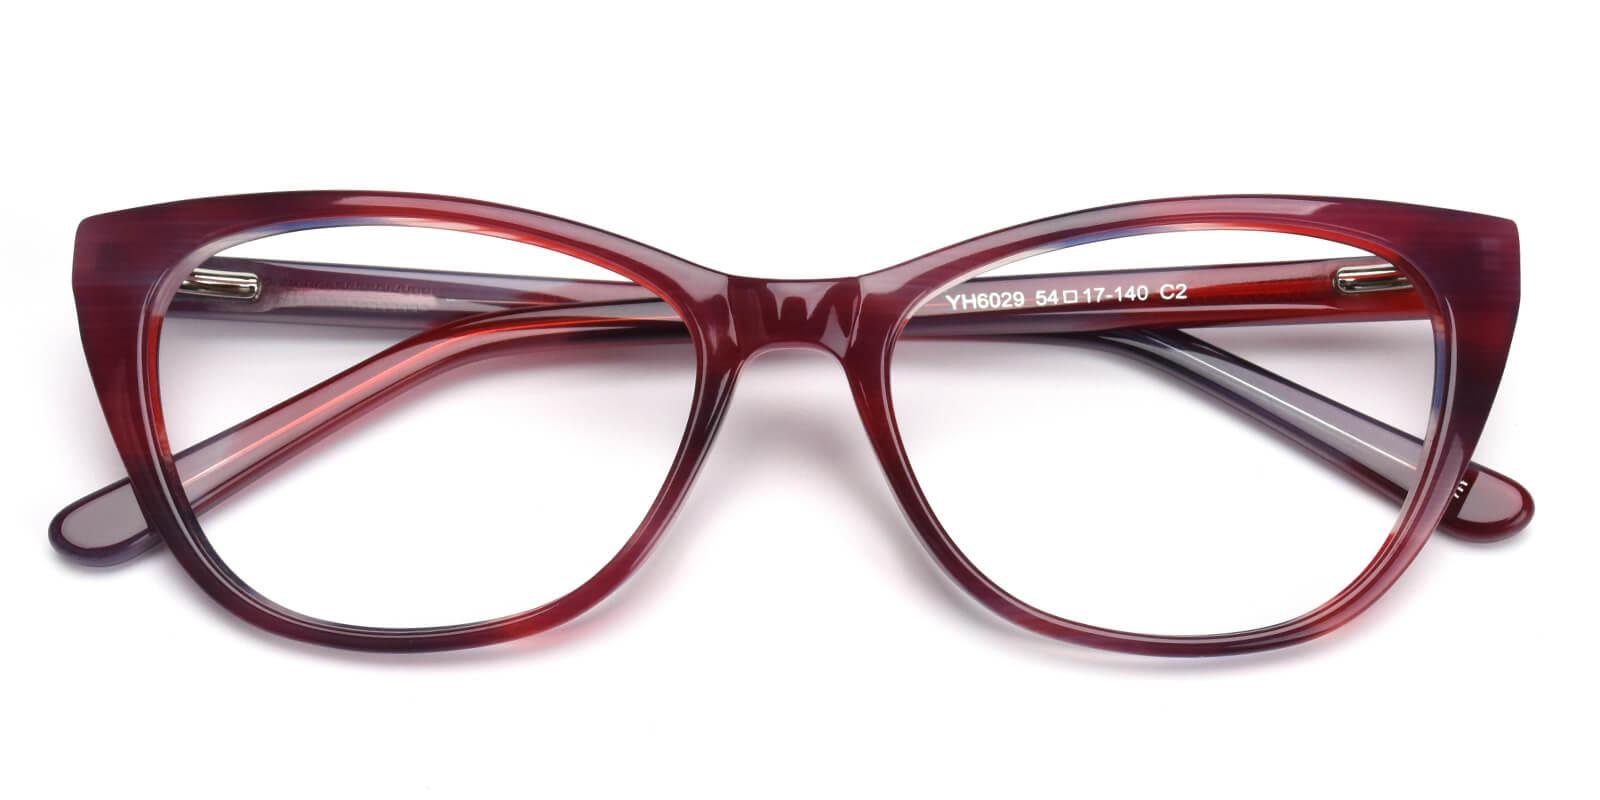 Chigo-Purple-Cat-Acetate-Eyeglasses-detail